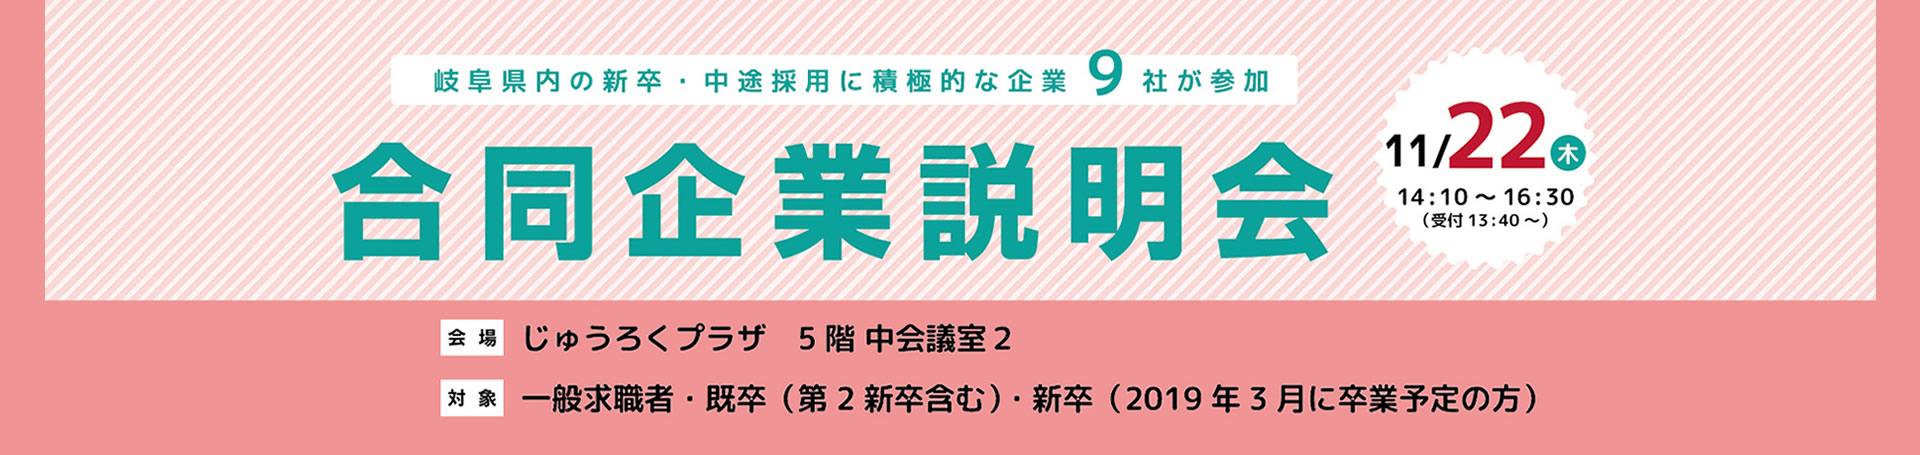 岐阜県内の新卒・中途採用に積極的な企業6社が参加。合同企業説明会11月22日